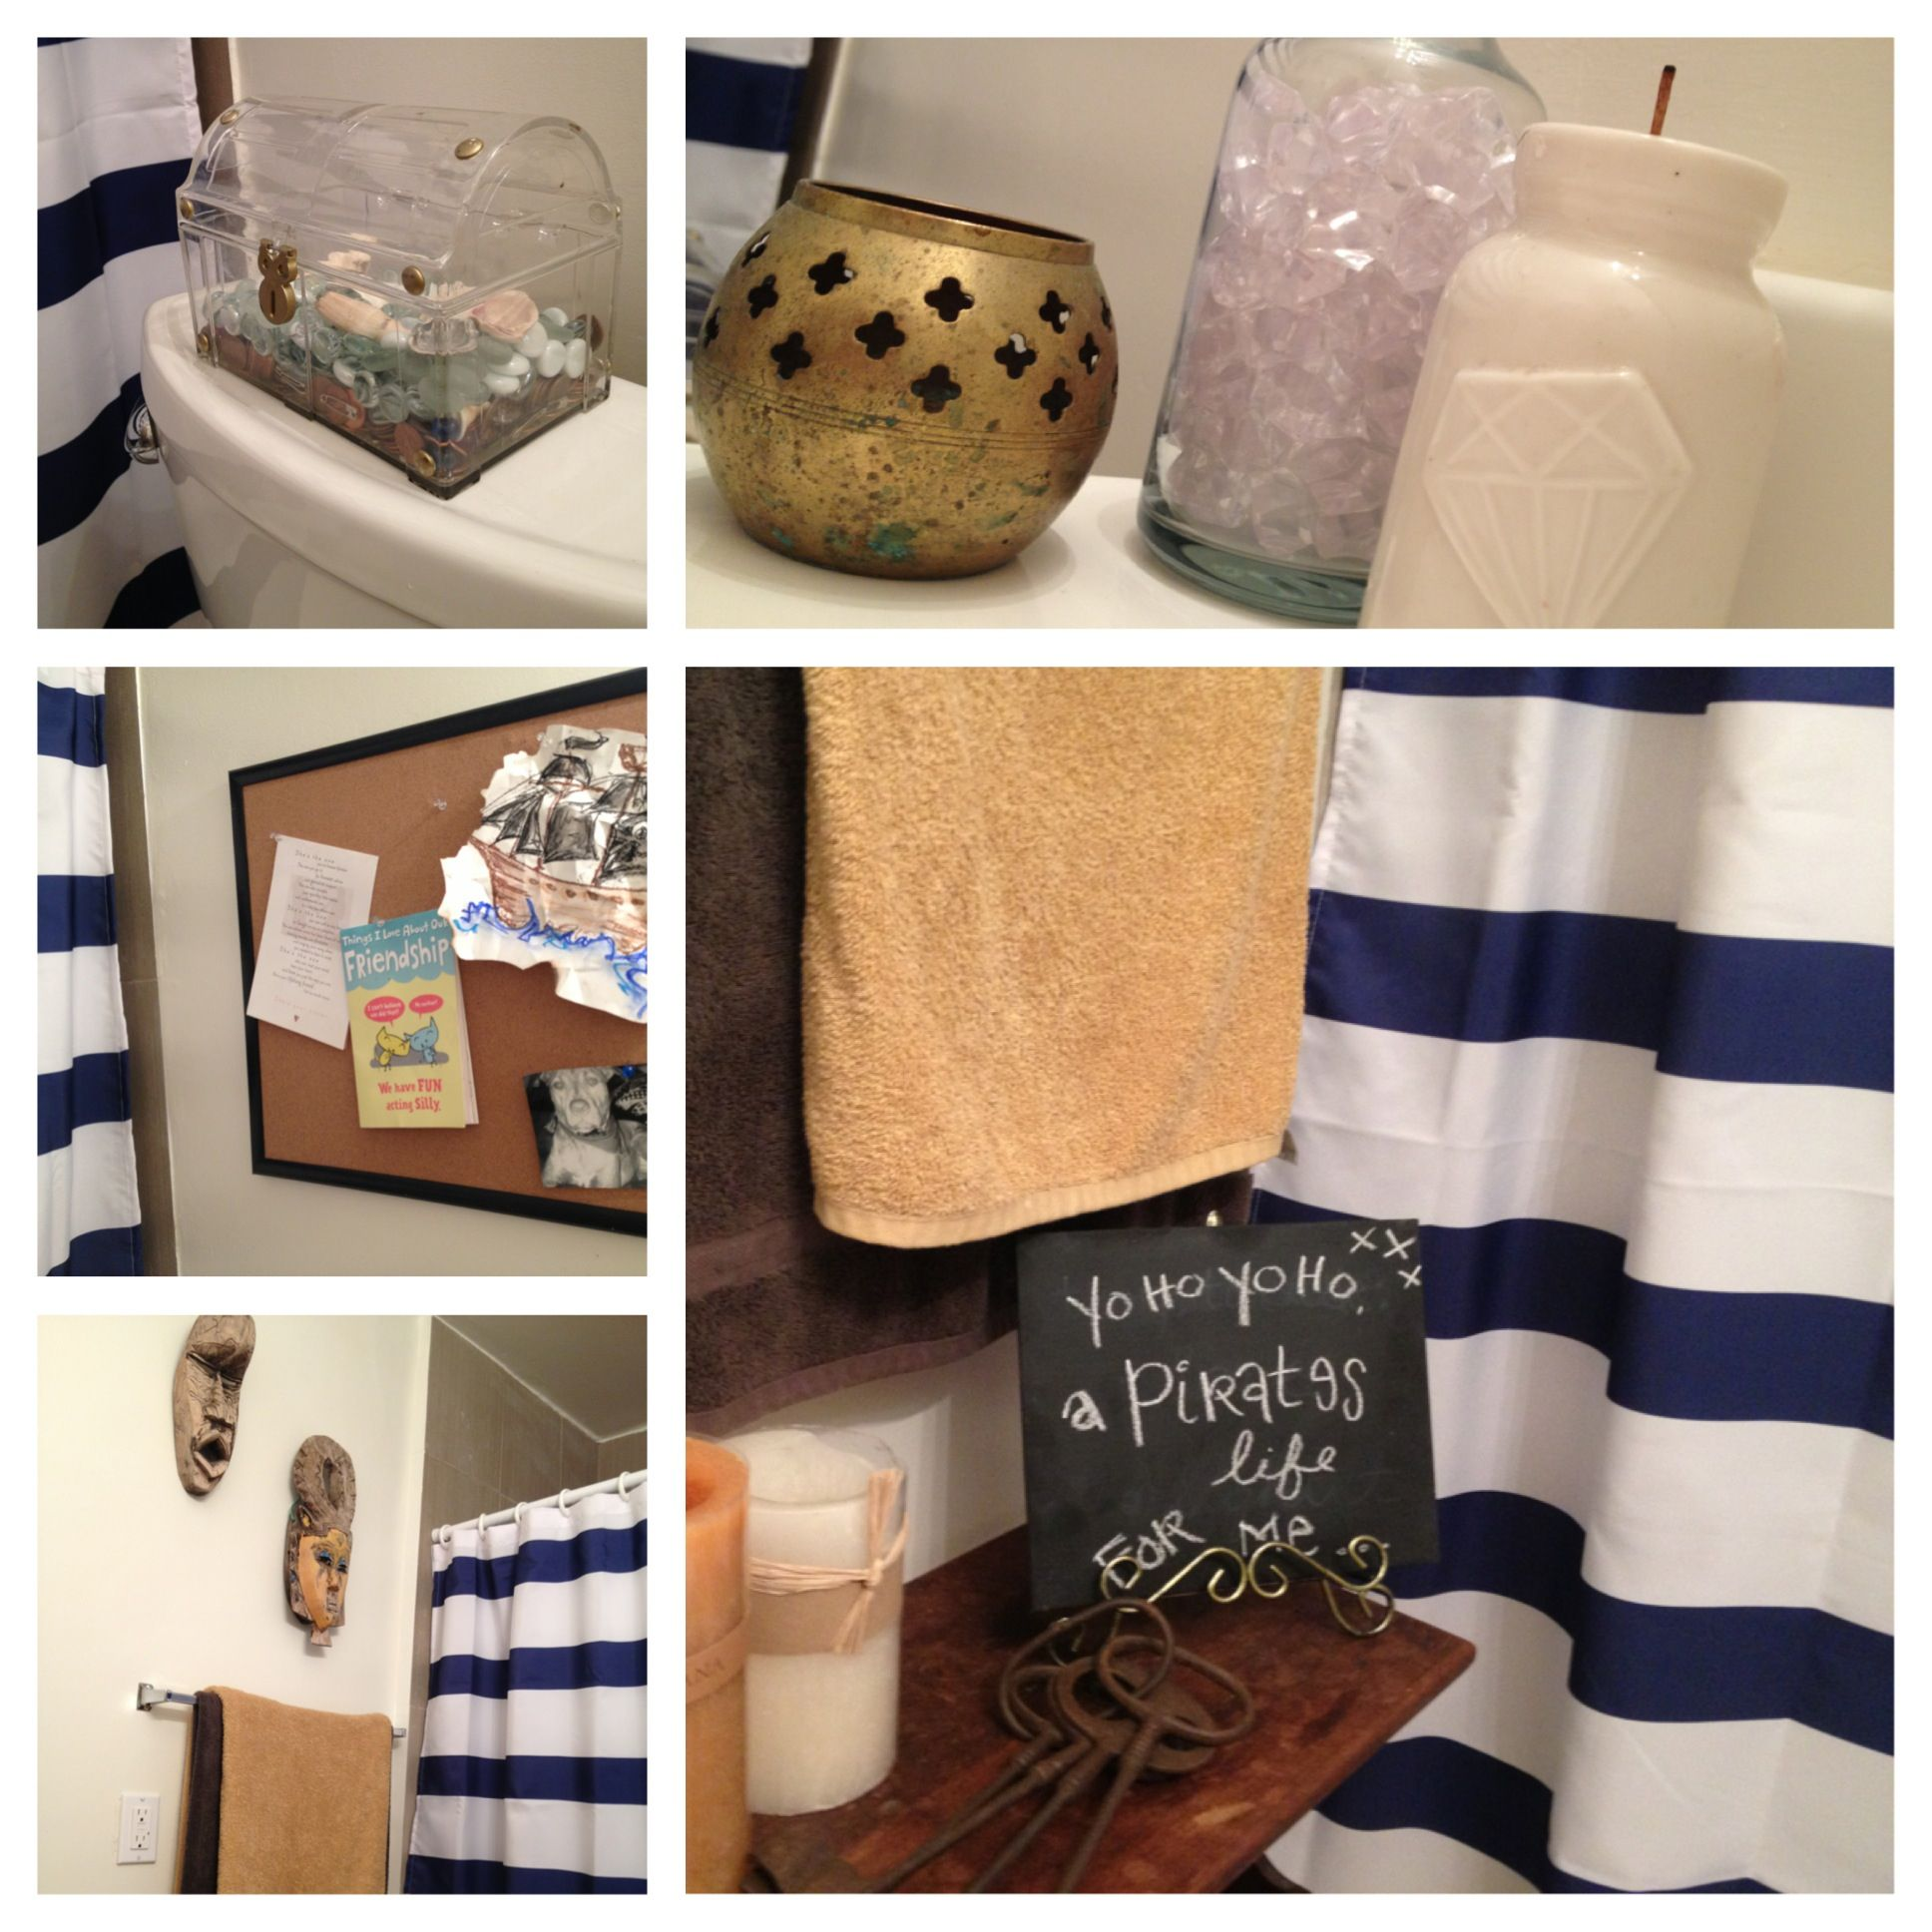 Kids Bathroom Ideas For Boys And S   Pirate Themed Bathroom Diy Pirate Bathroom Dannidoesit